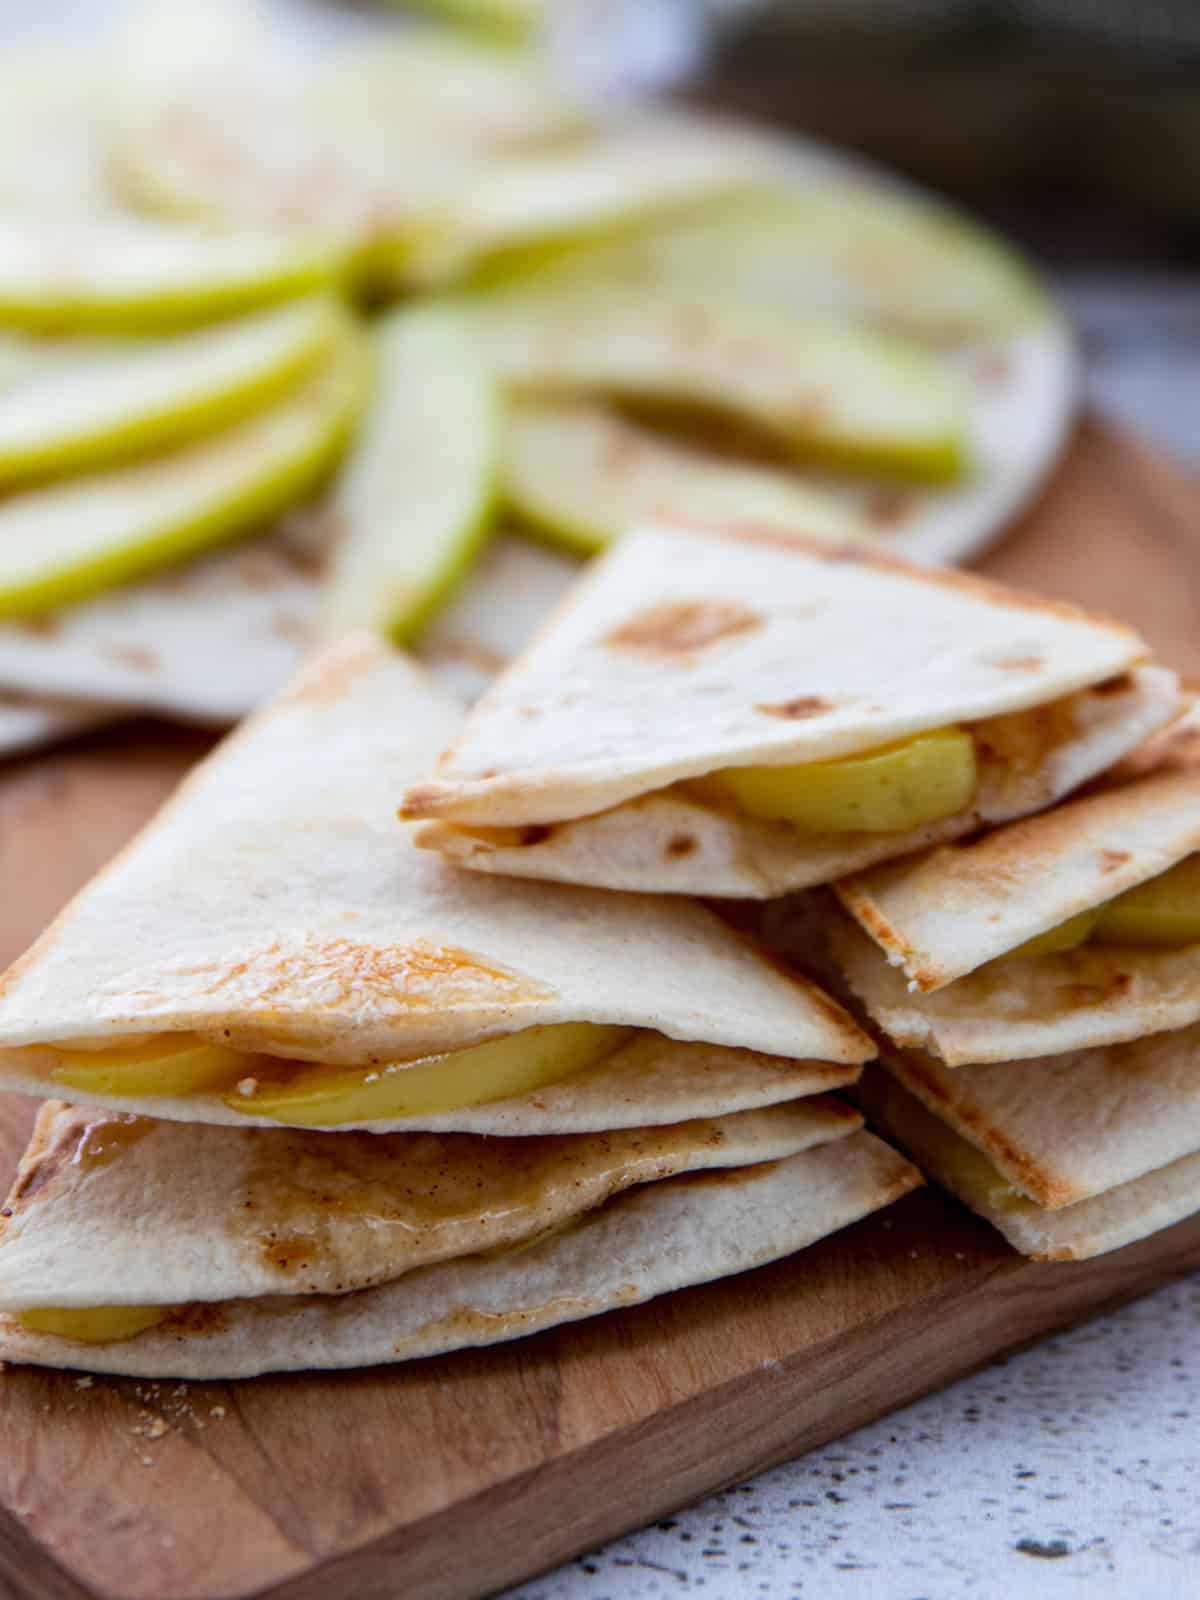 Easy Spiced Apple Quesadillas